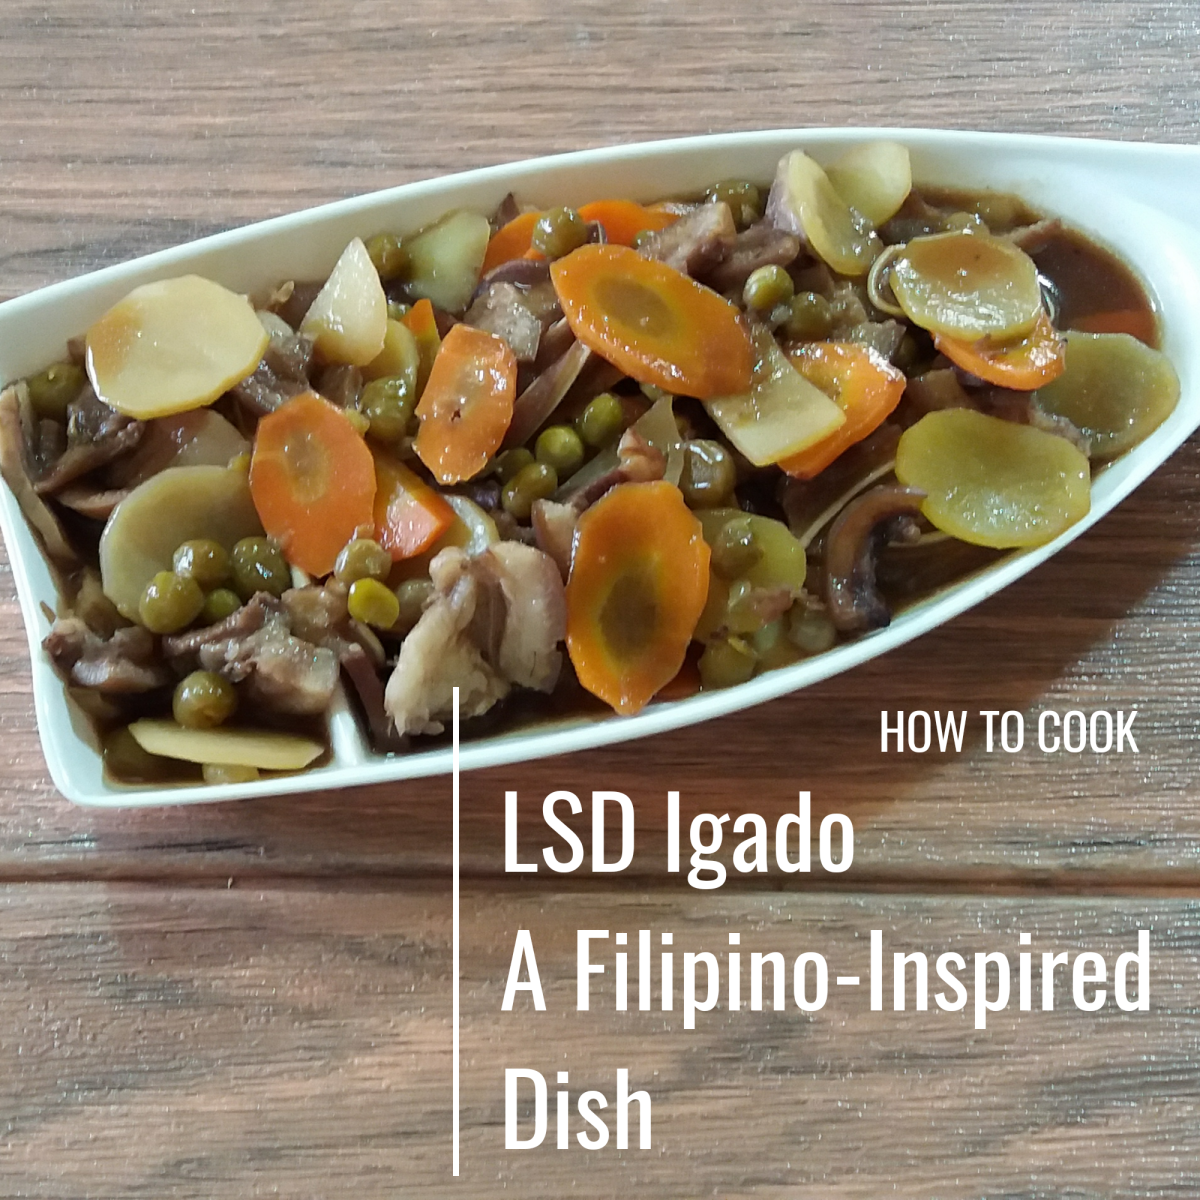 How to Make LSD Igado: A Filipino-Inspired Dish